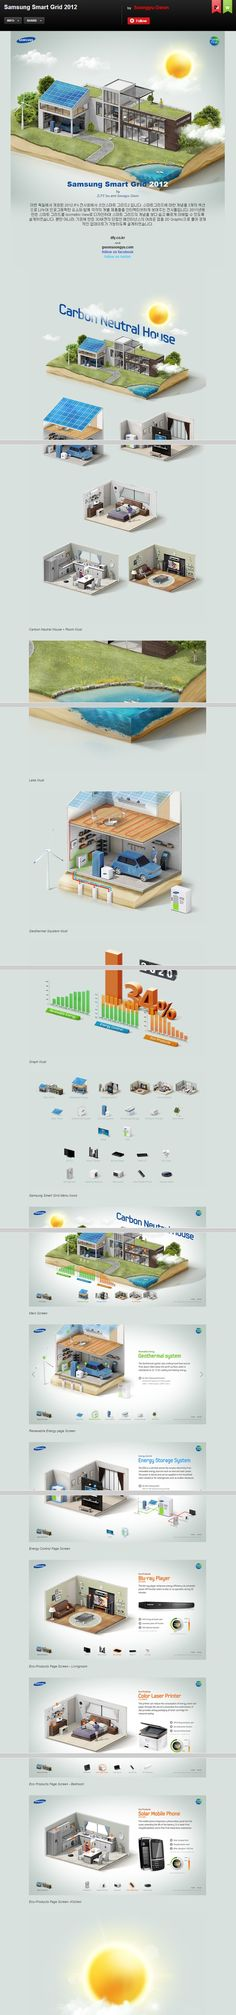 #Samsung #Smart #Grid #2012